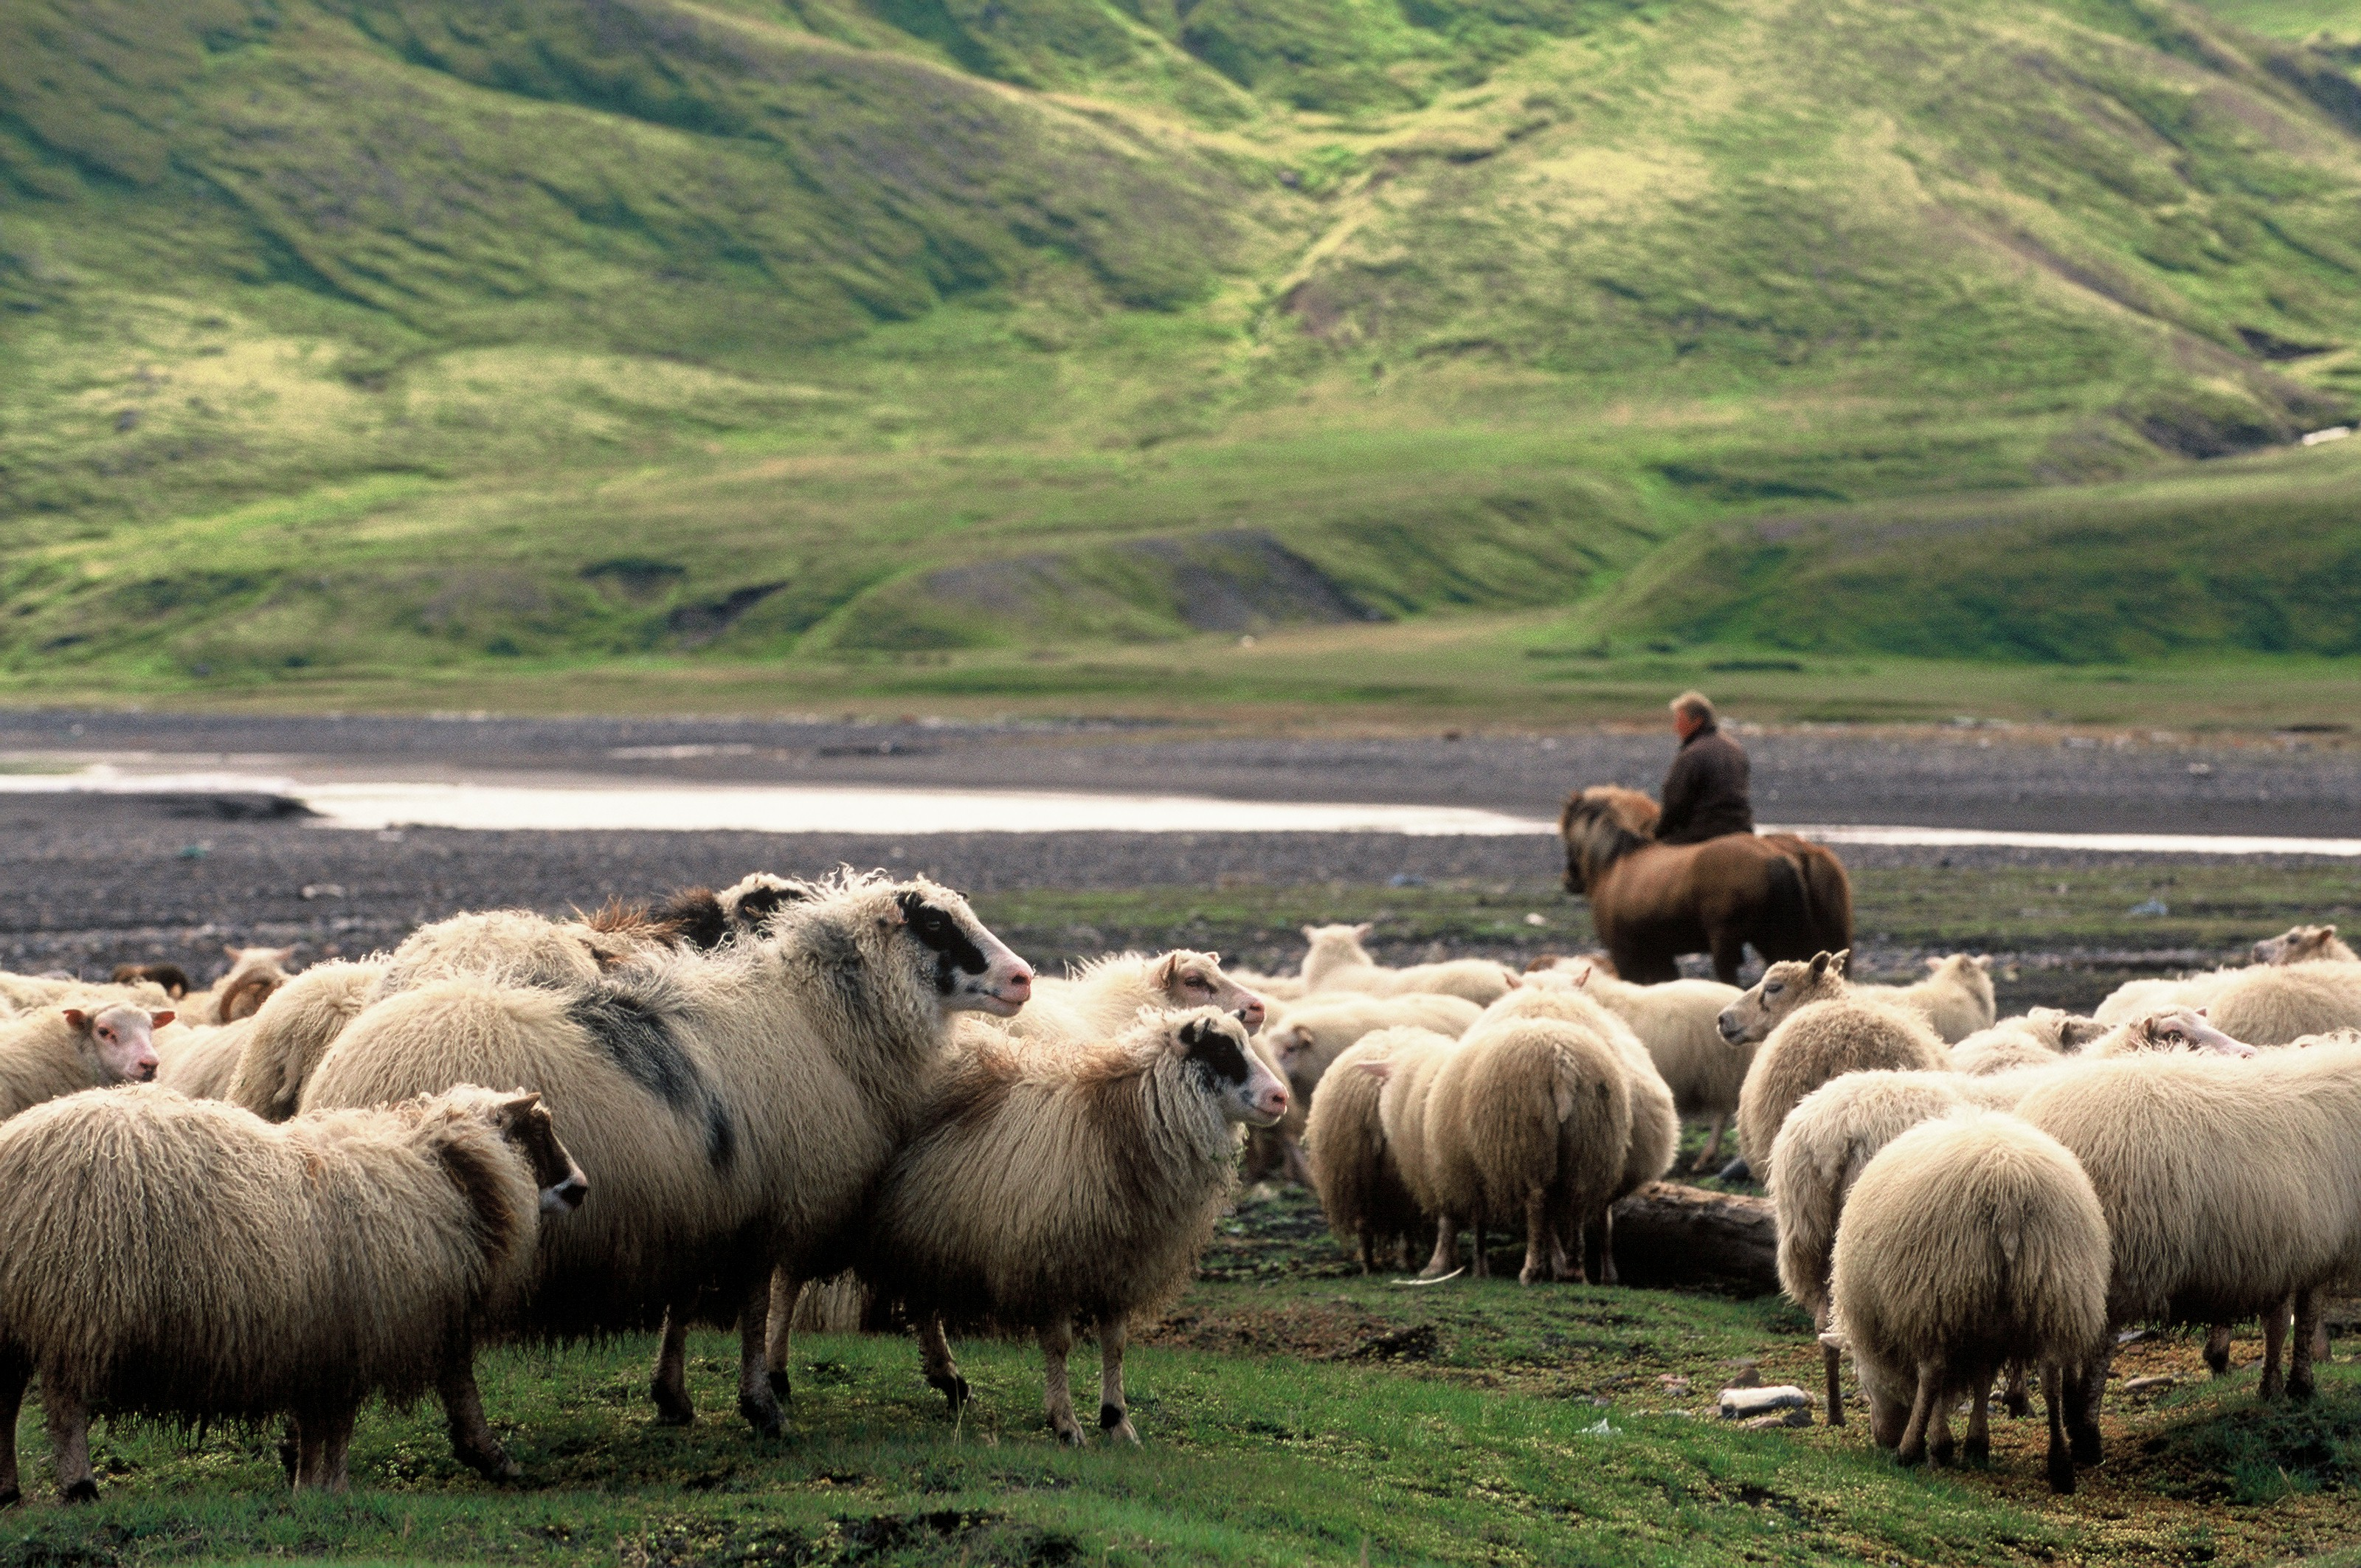 A local getting ready for sheep roundup, near Borgarfjörður Eystri, Iceland.